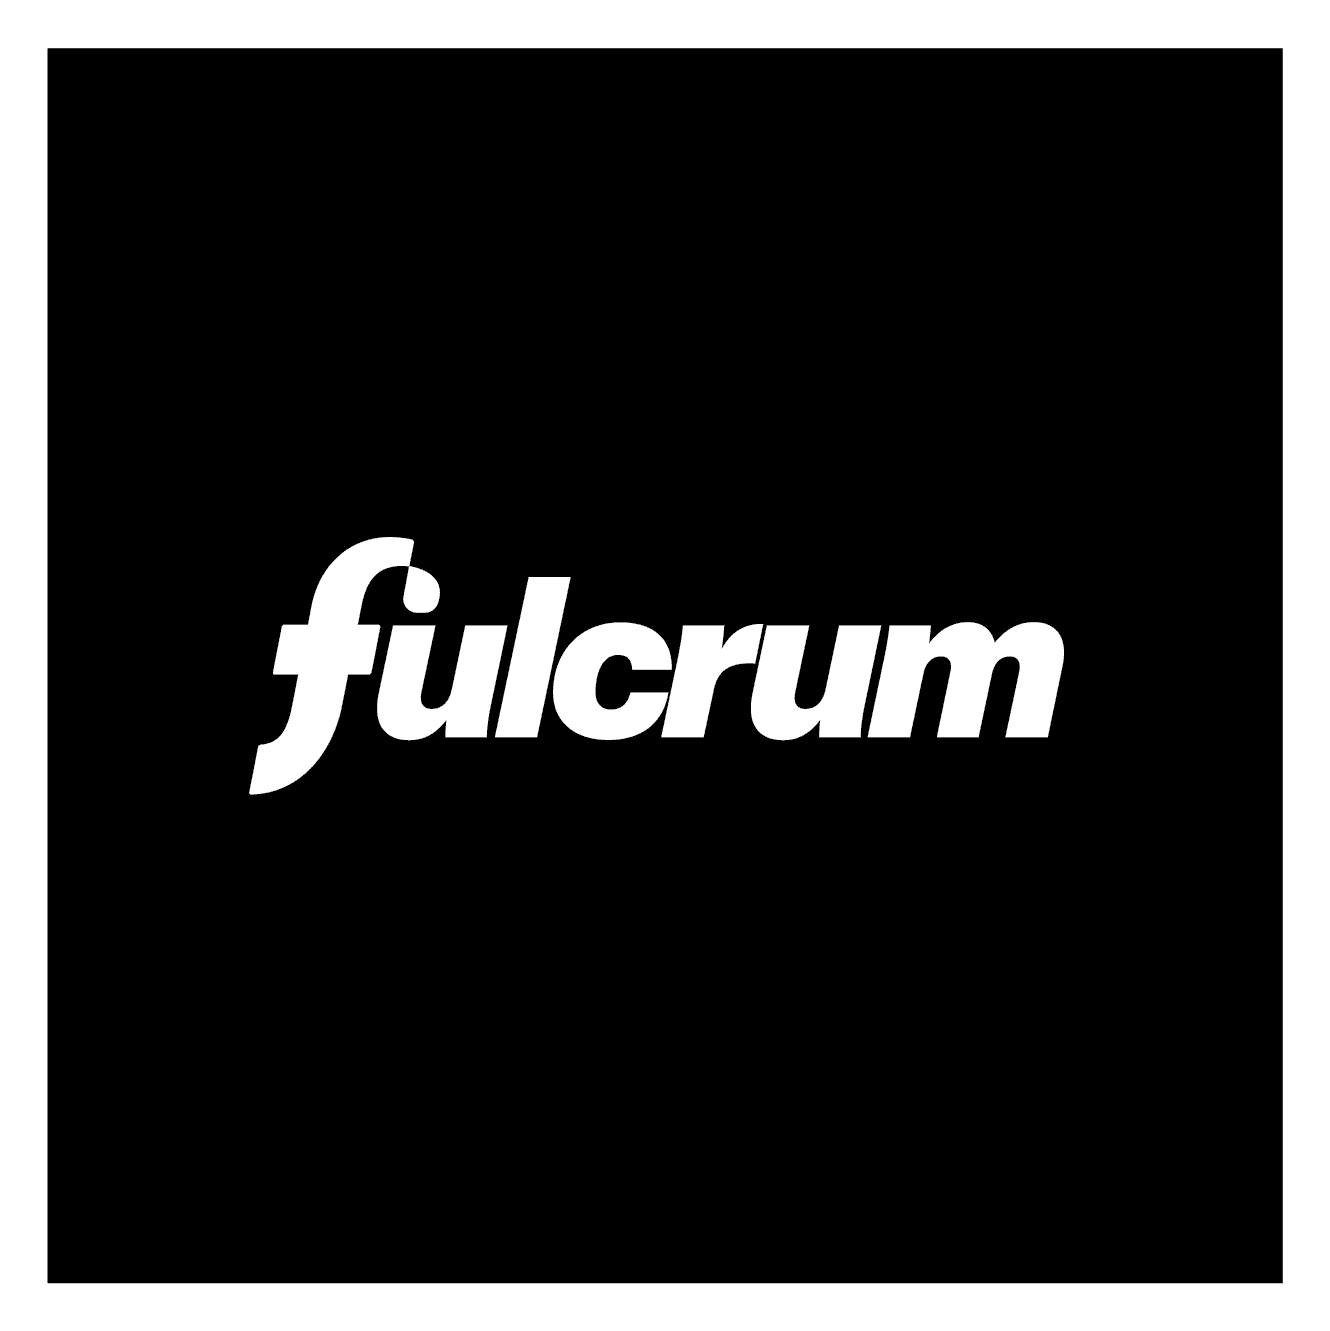 fulcrum_logosinitialselects_020419-60